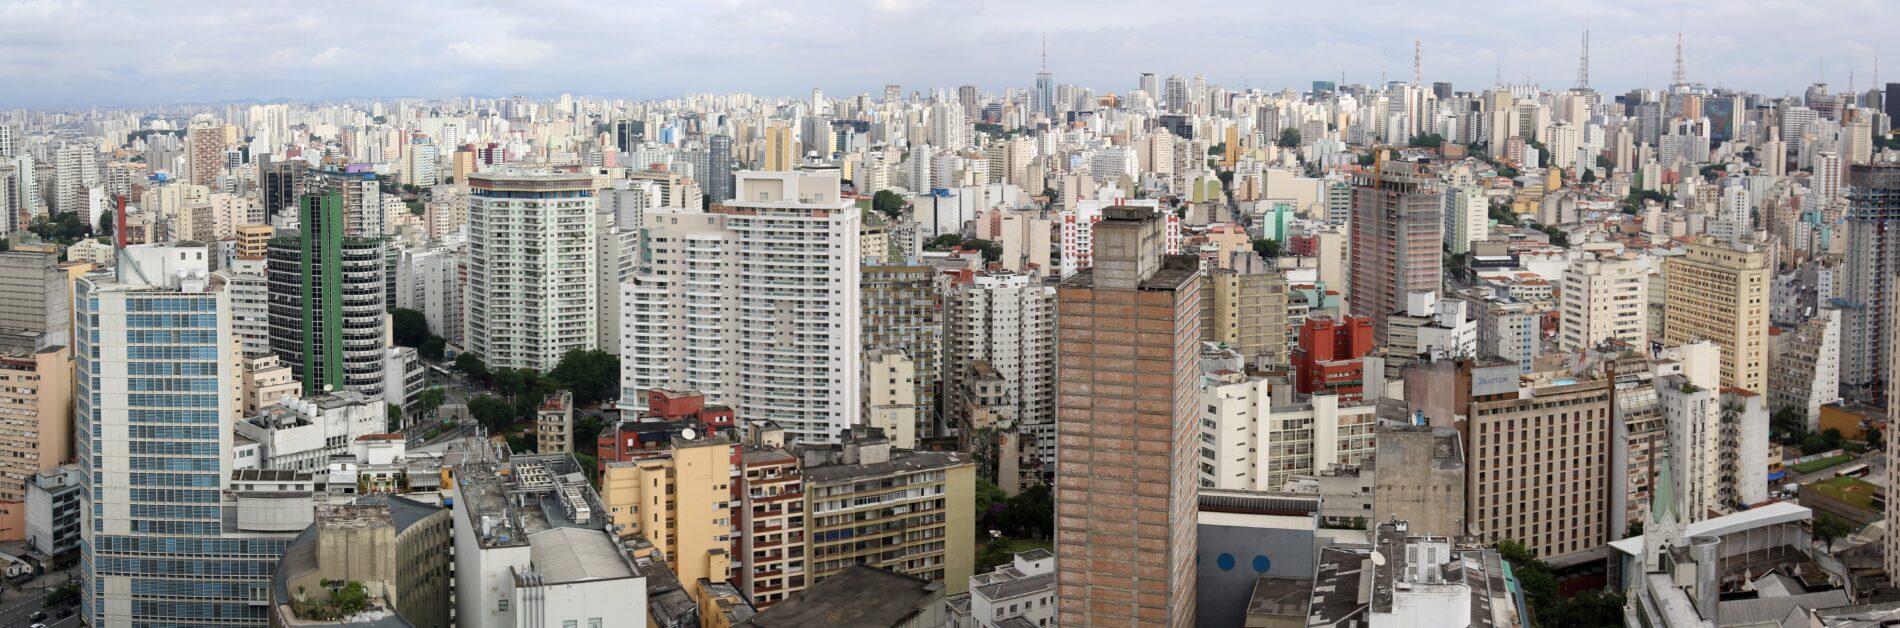 Sao-paulo-1194935-brazil-pixbay